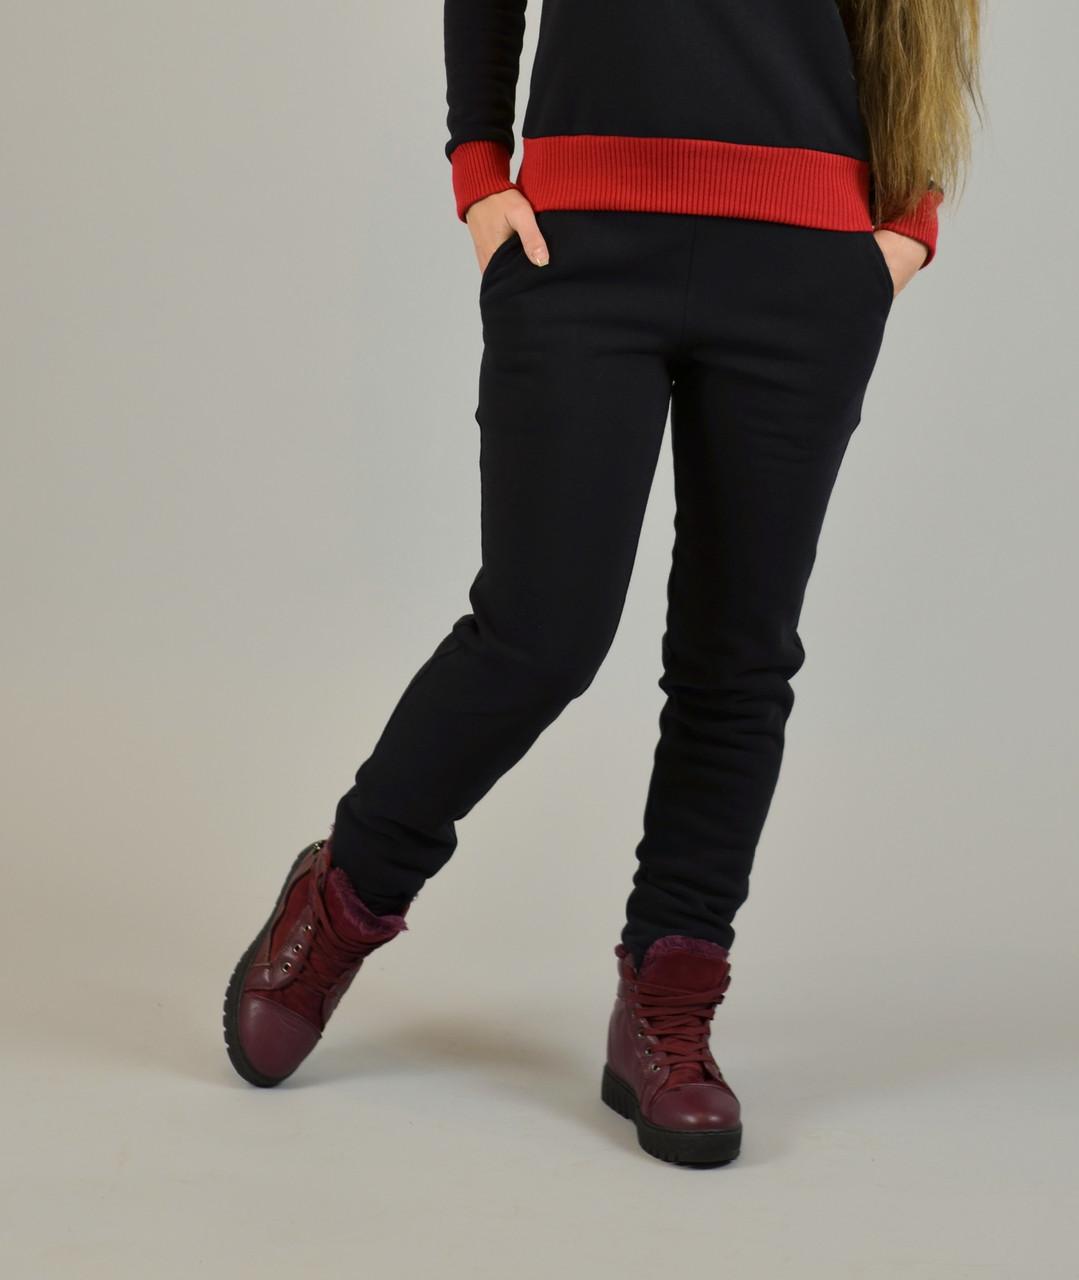 Теплые женские штаны